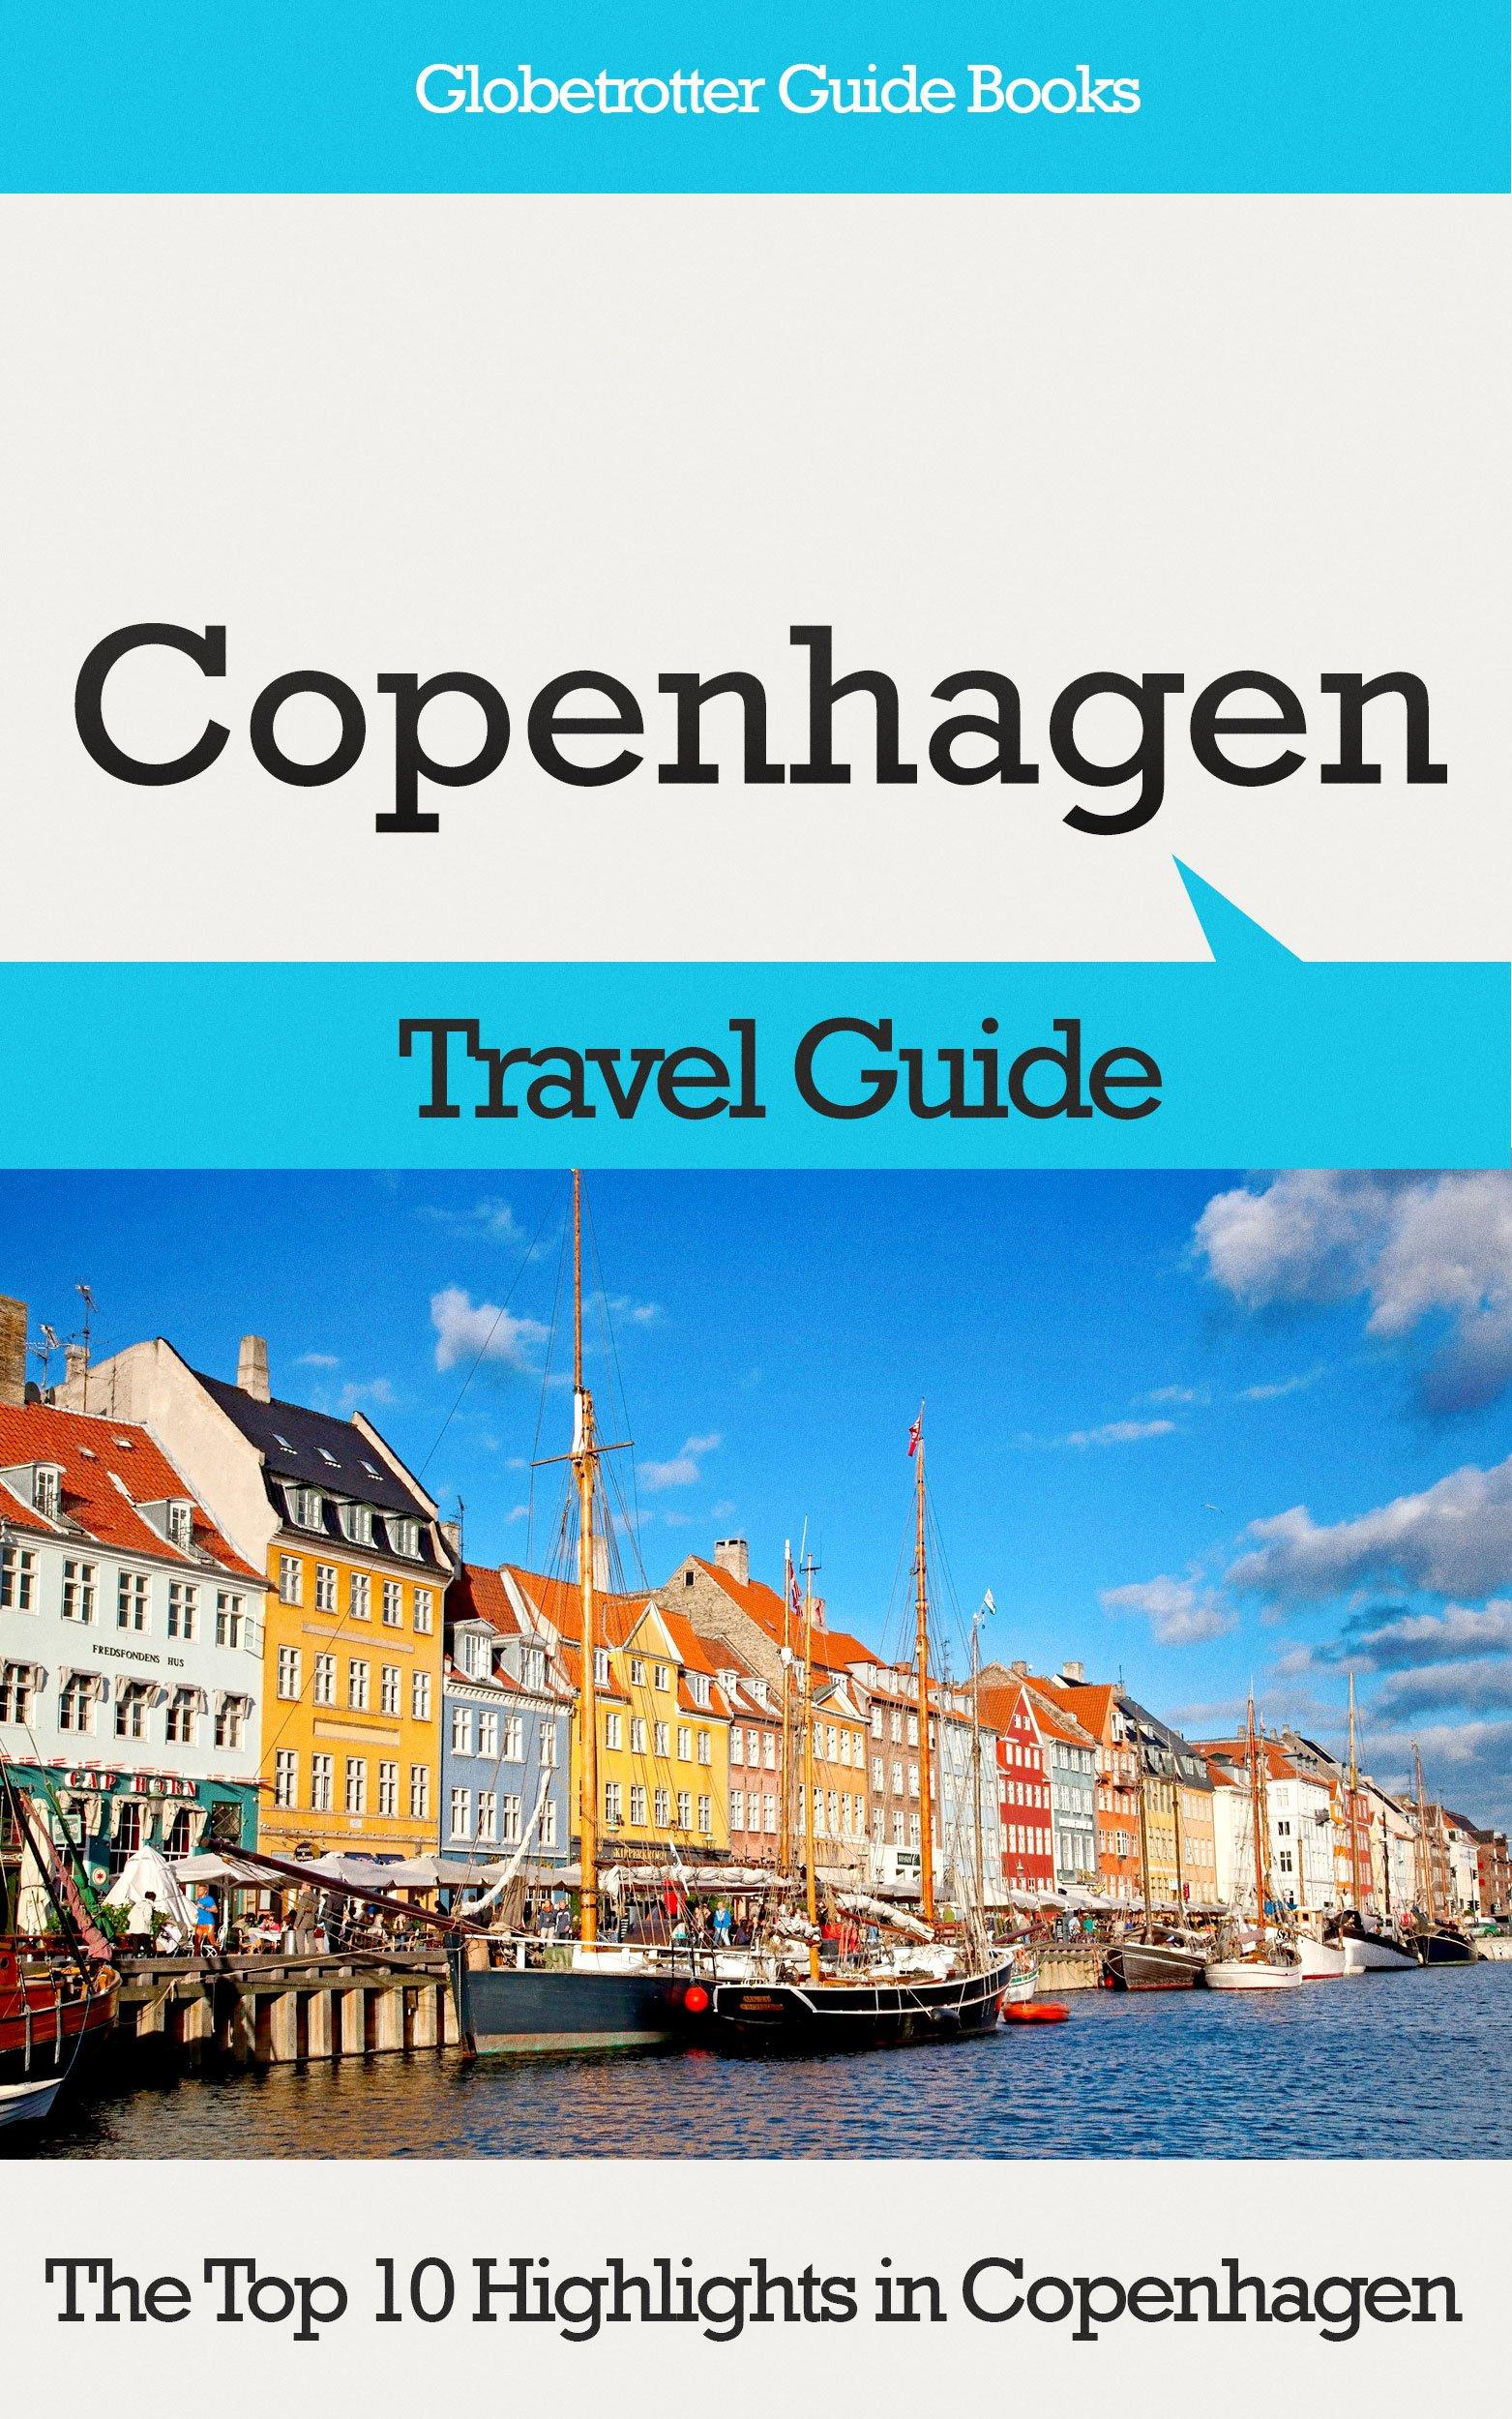 Copenhagen Travel Guide  The Top 10 Highlights In Copenhagen  Globetrotter Guide Books   English Edition